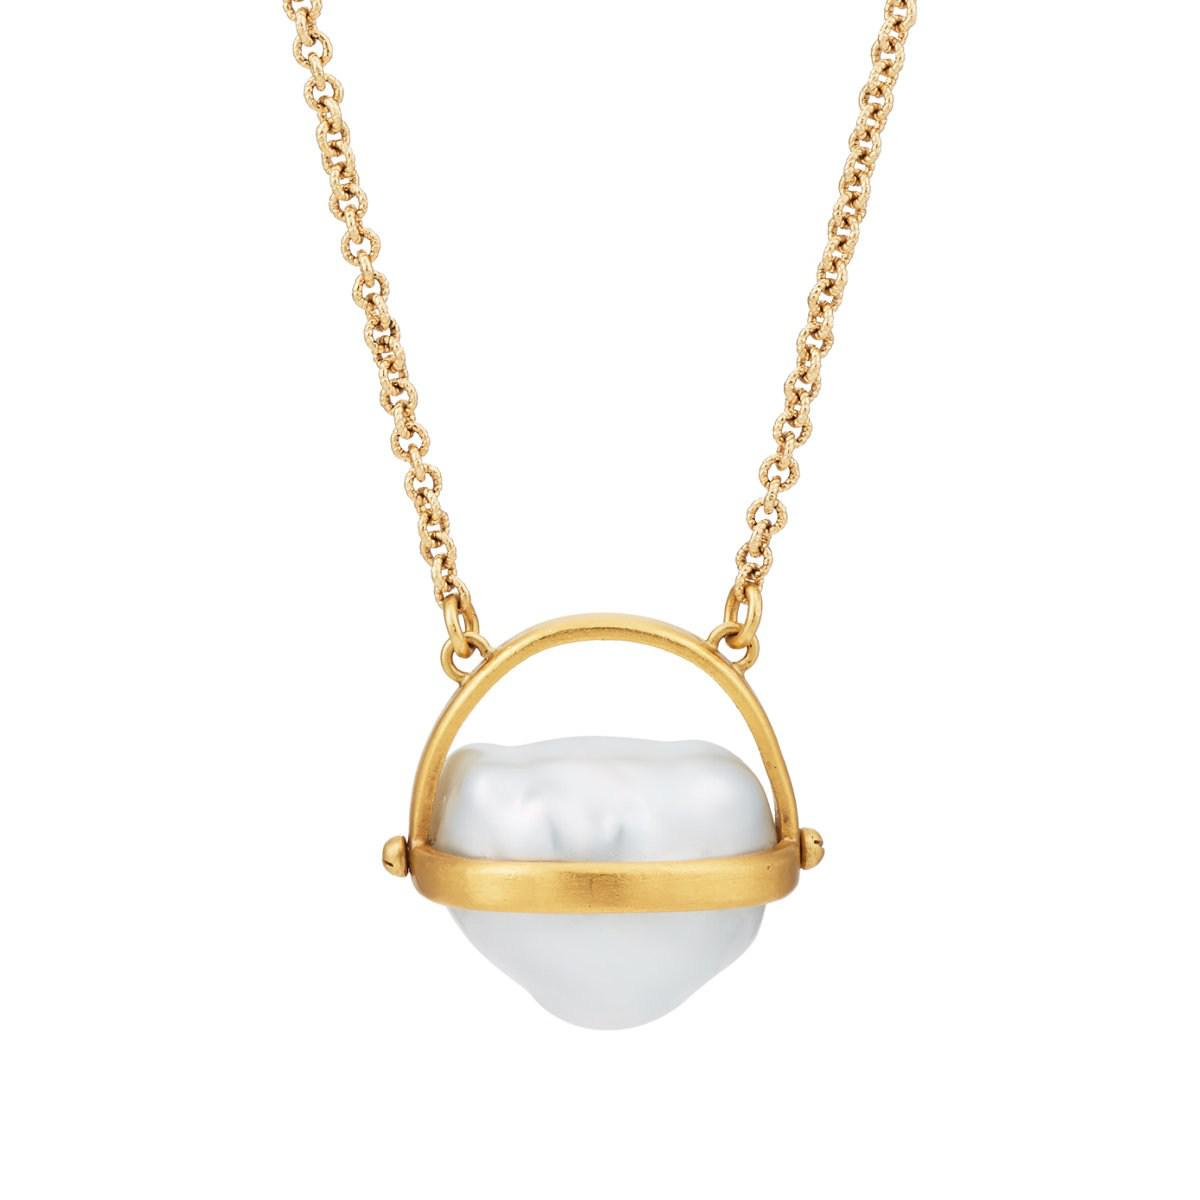 Eli Halili Womens Cartouche Necklace uvd0ESe